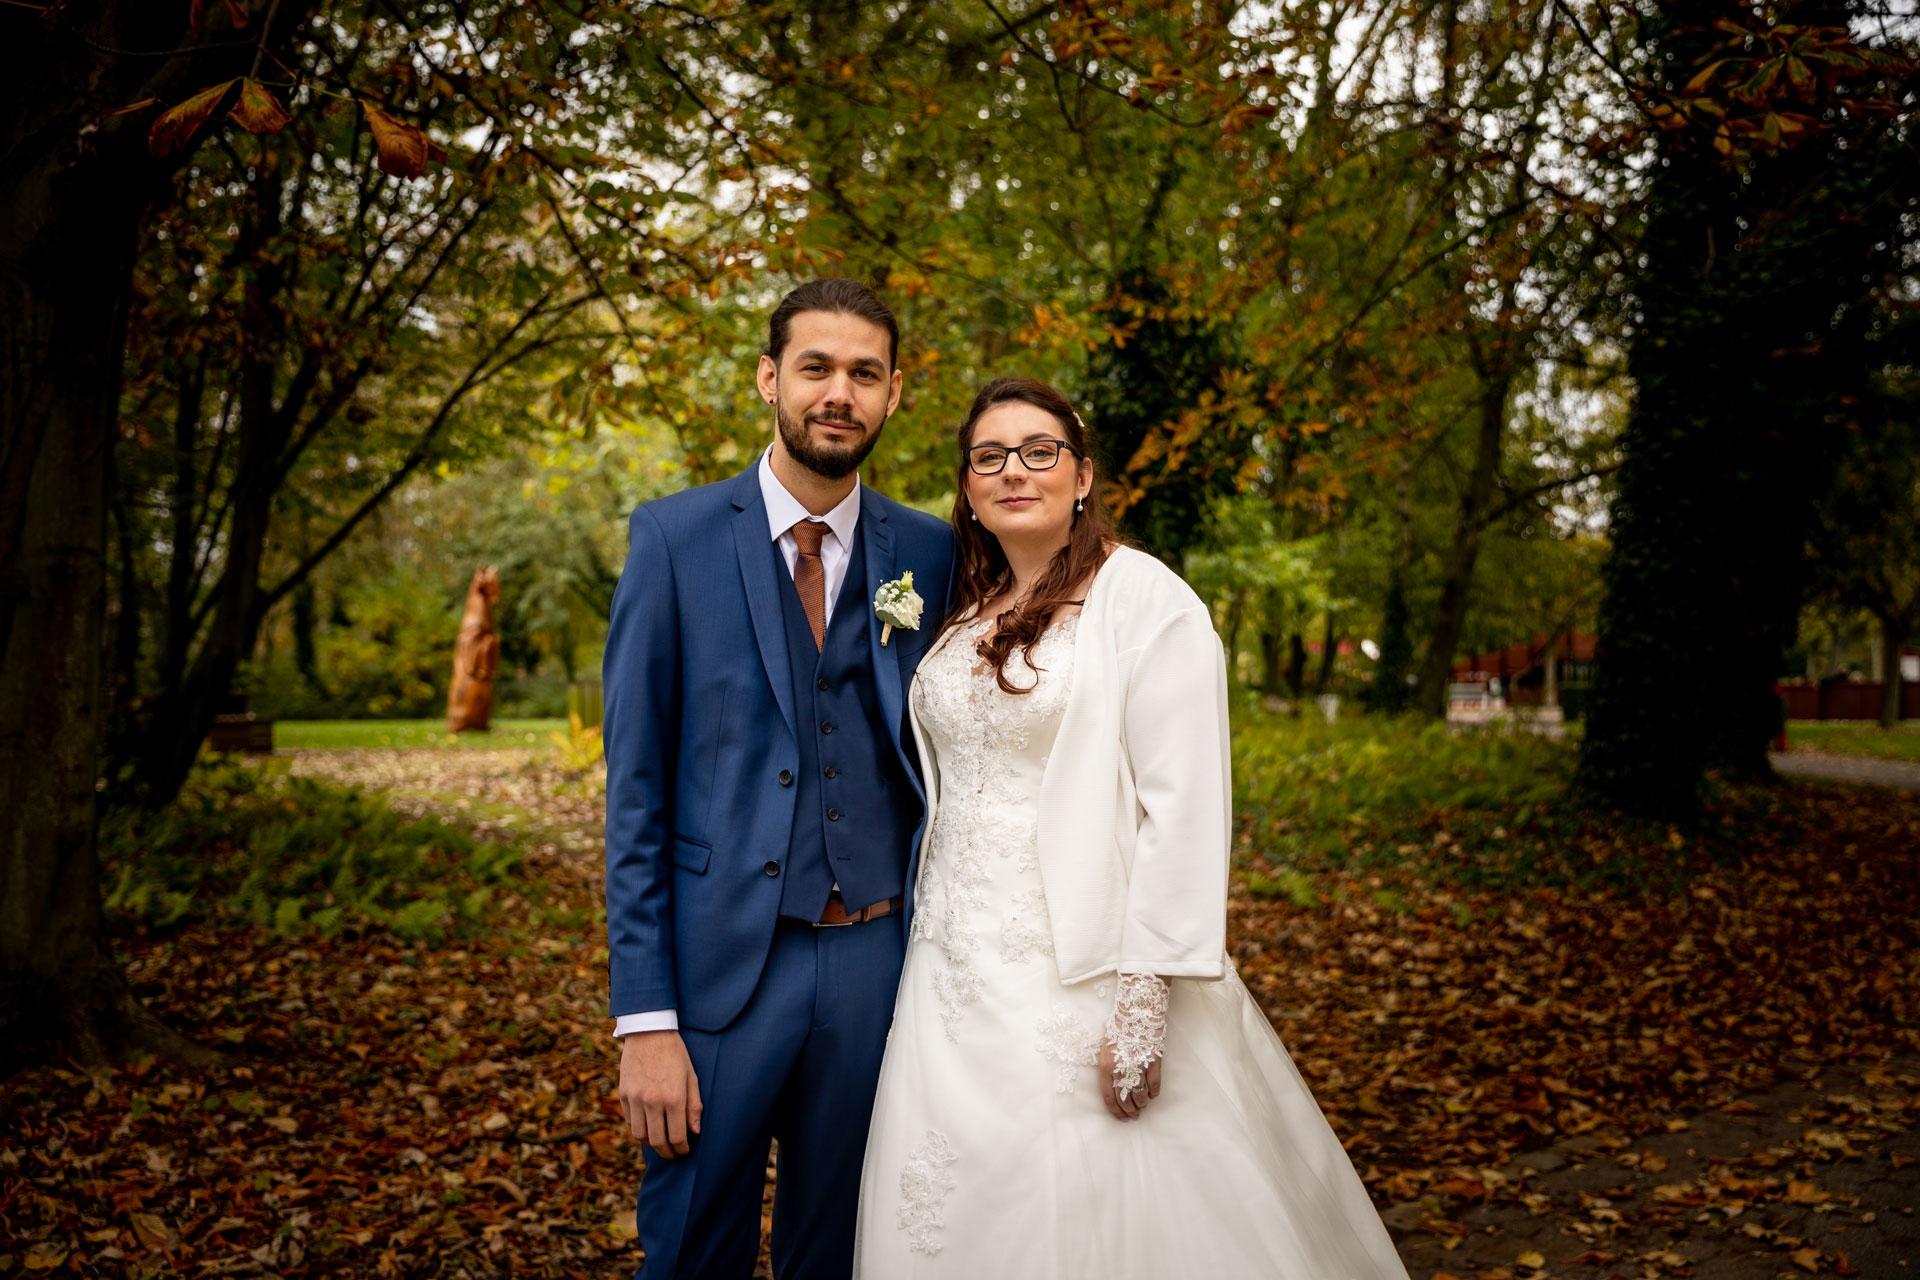 20201017-mariage-justine-alexandre-44